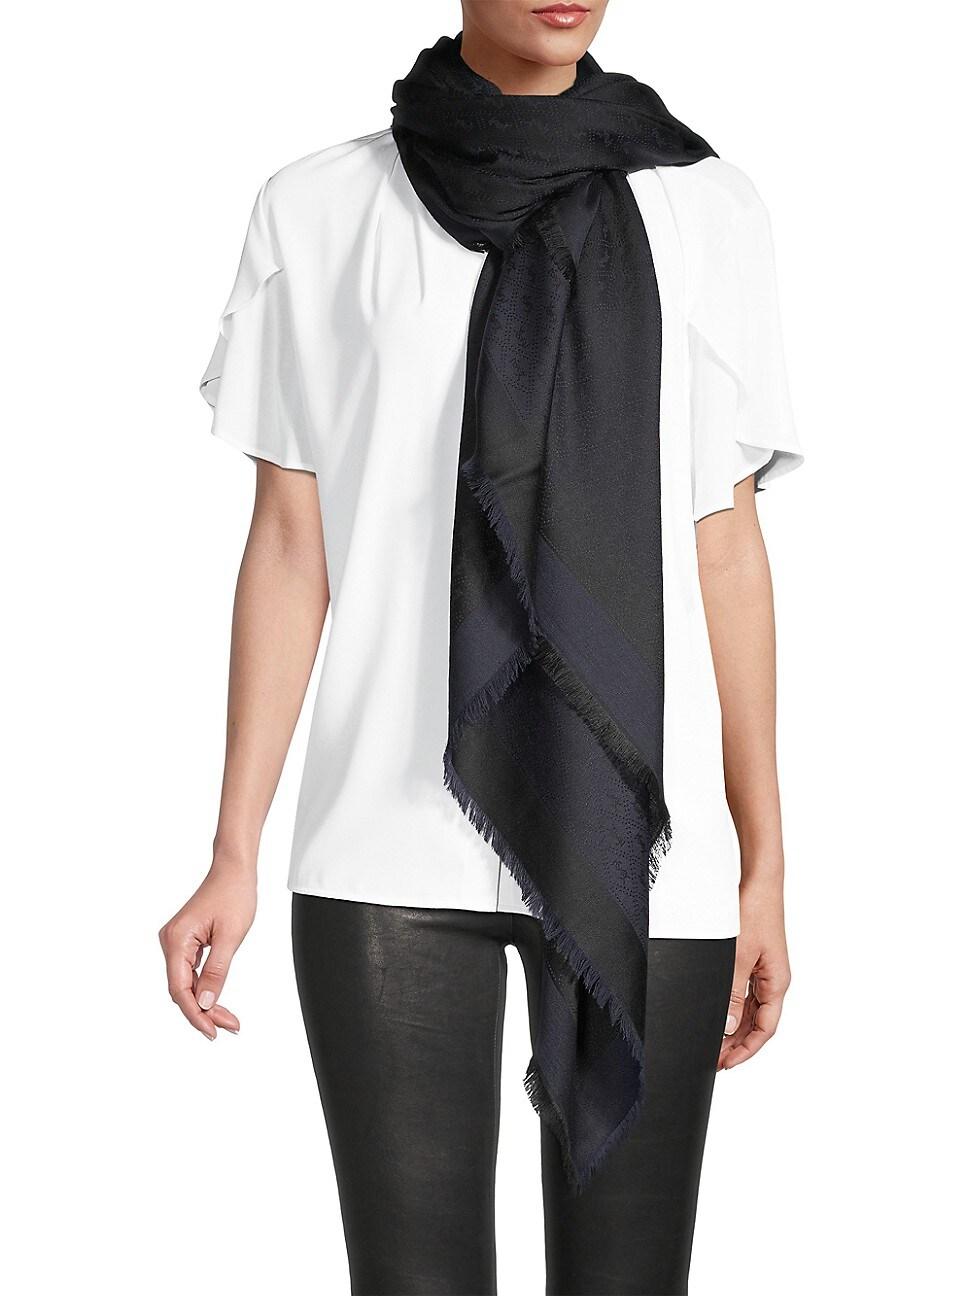 Saint Laurent Sciarpa Grand Monogram Silk & Wool Square Scarf In Black